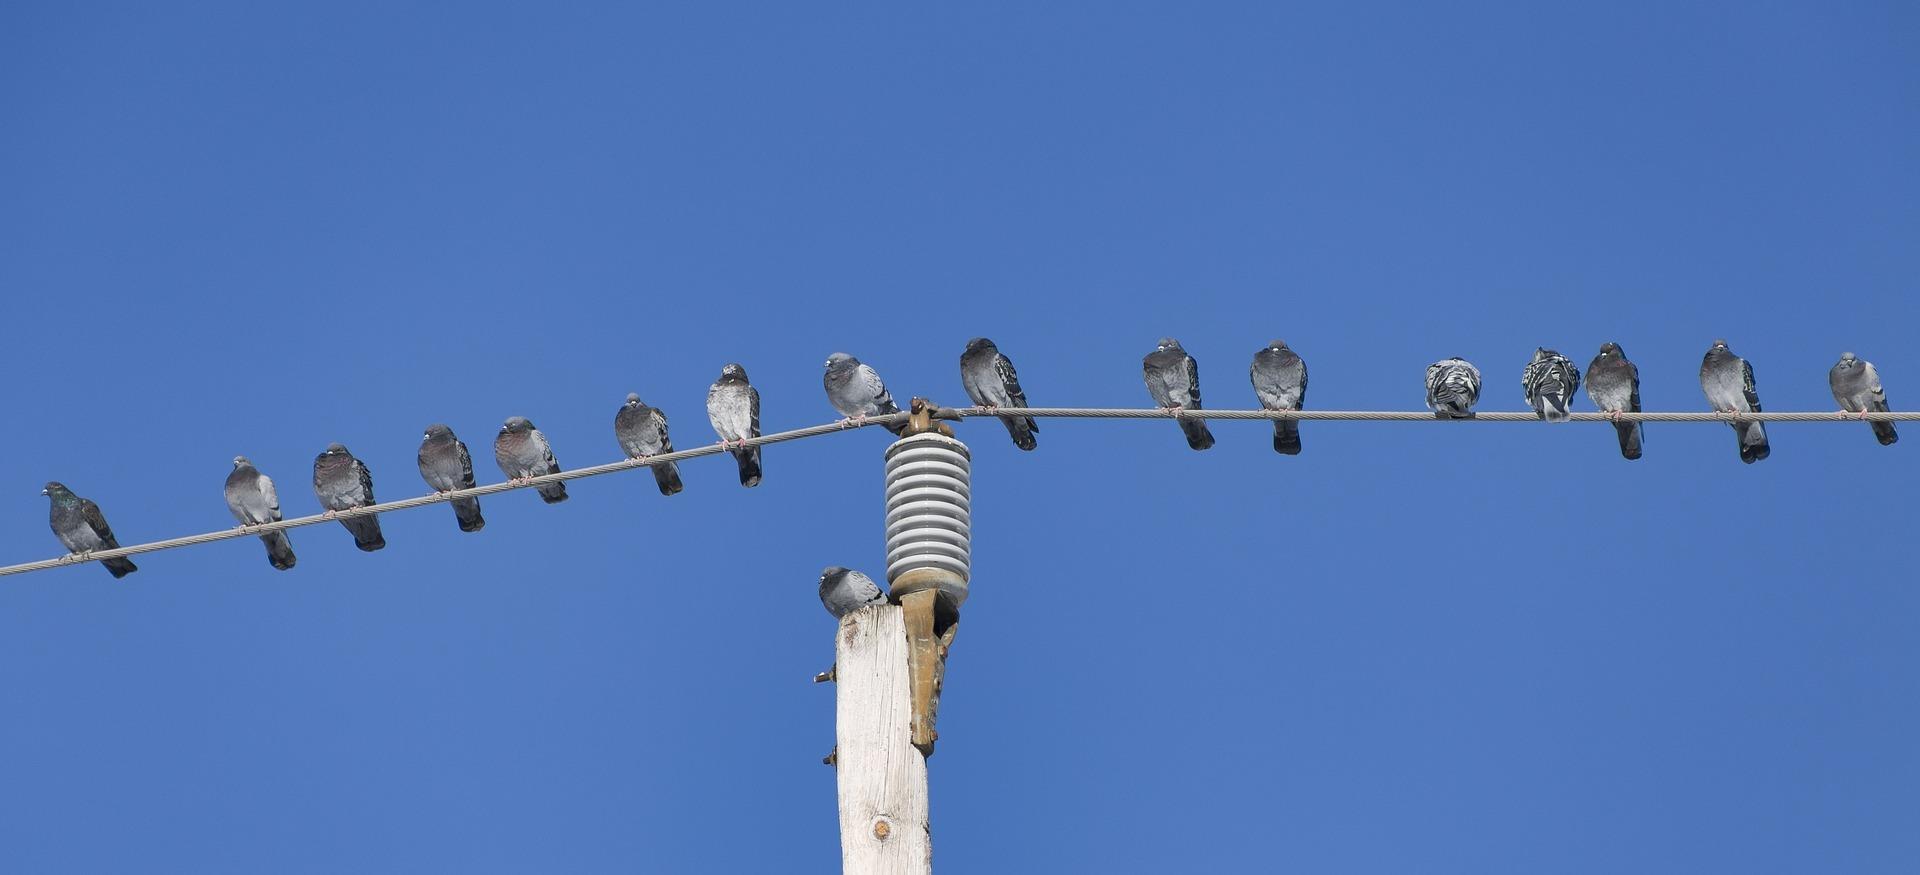 birds-1162384_1920